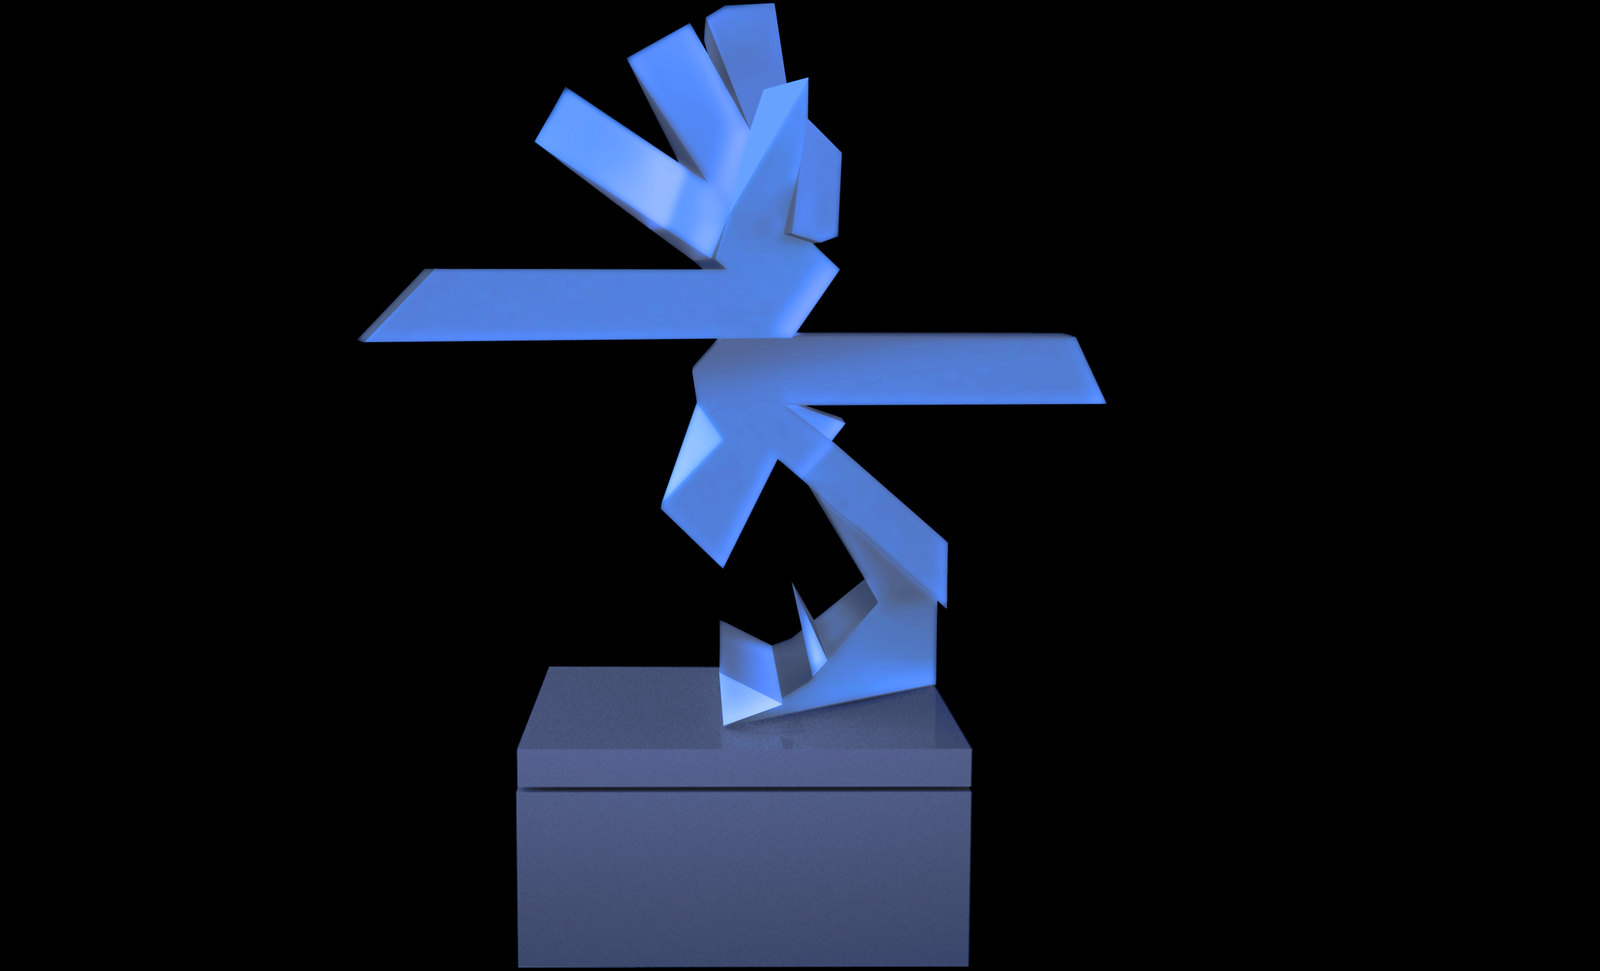 Escultura MAM mx 031